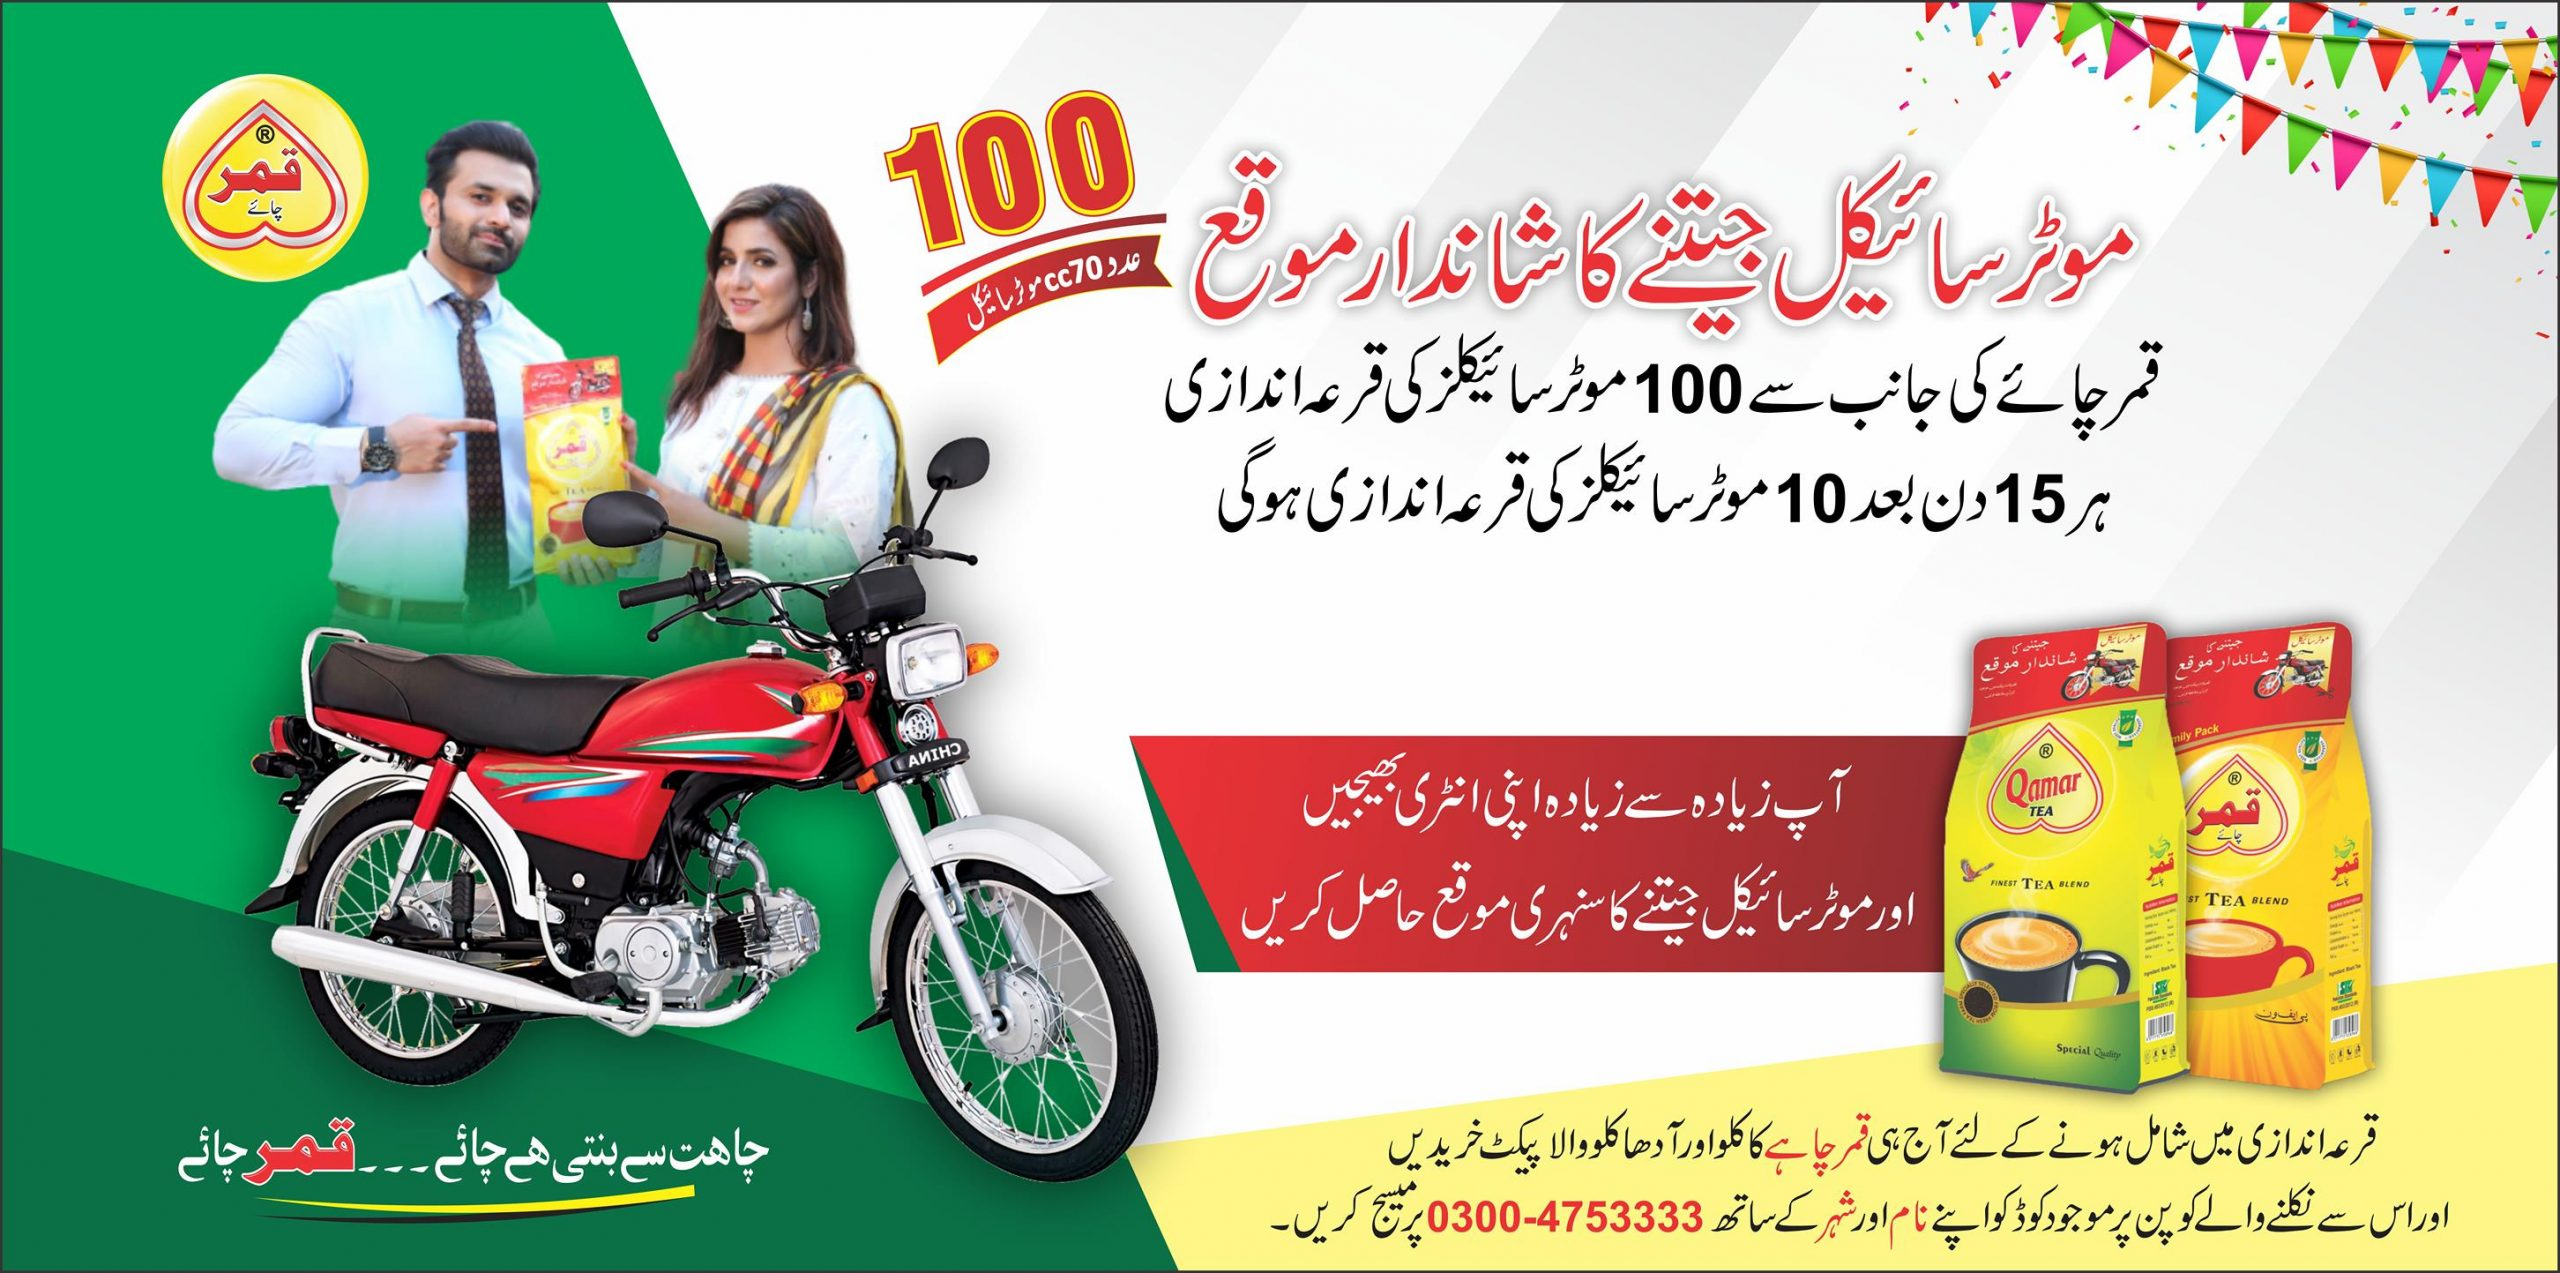 Qamar Tea Motorcycle Lucky Draw 28 February Full List Draw#10